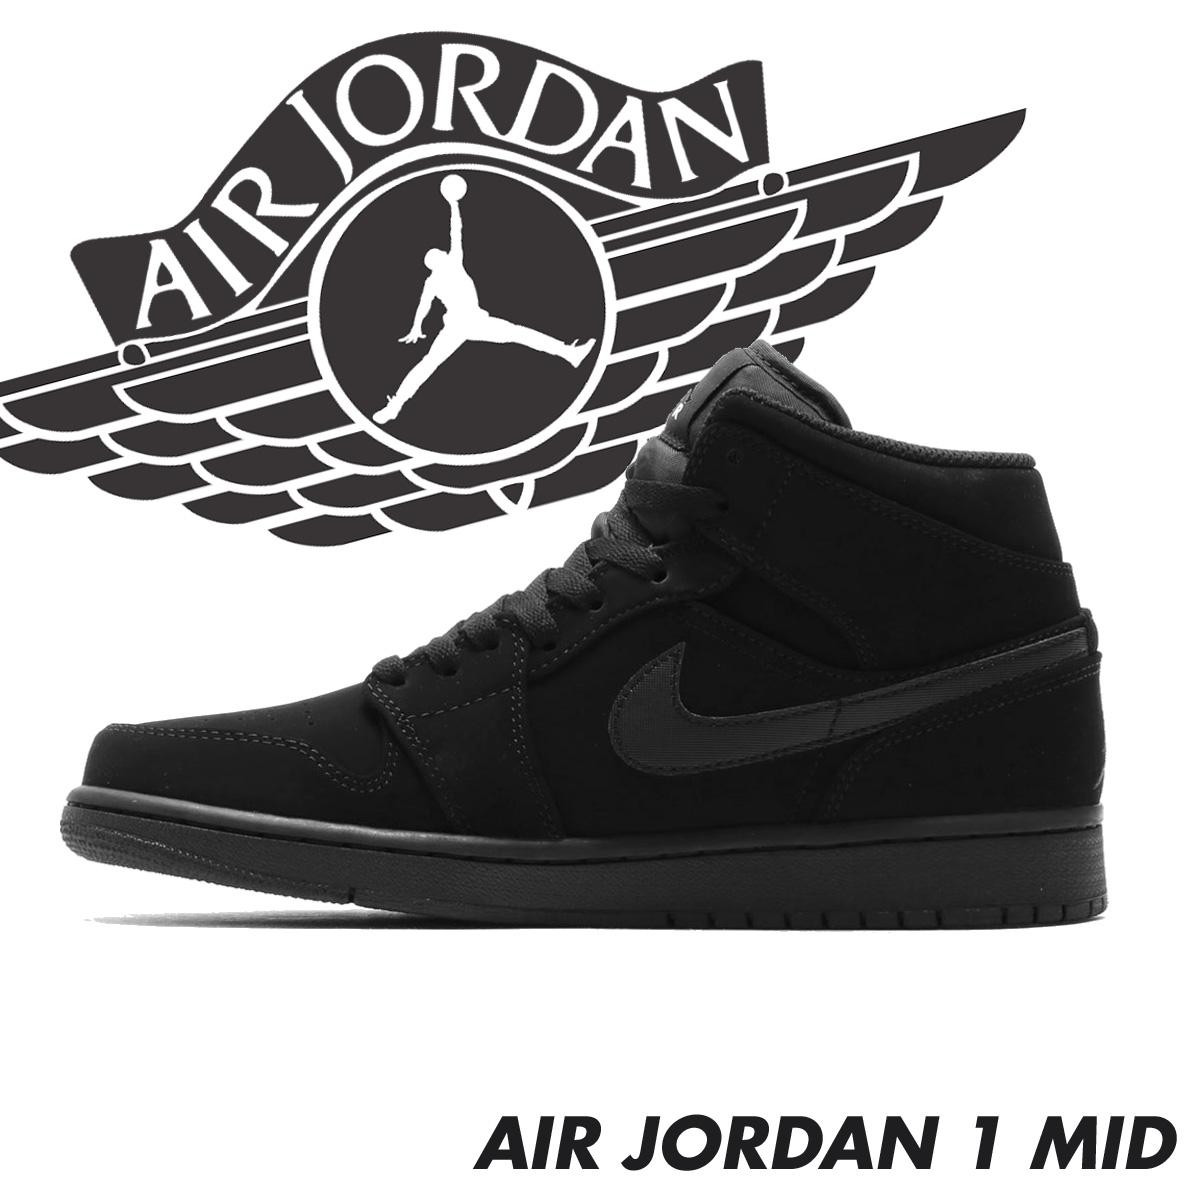 Allsports Nike Air Jordan 1 Mid Nike Air Jordan 1 Sneakers Men